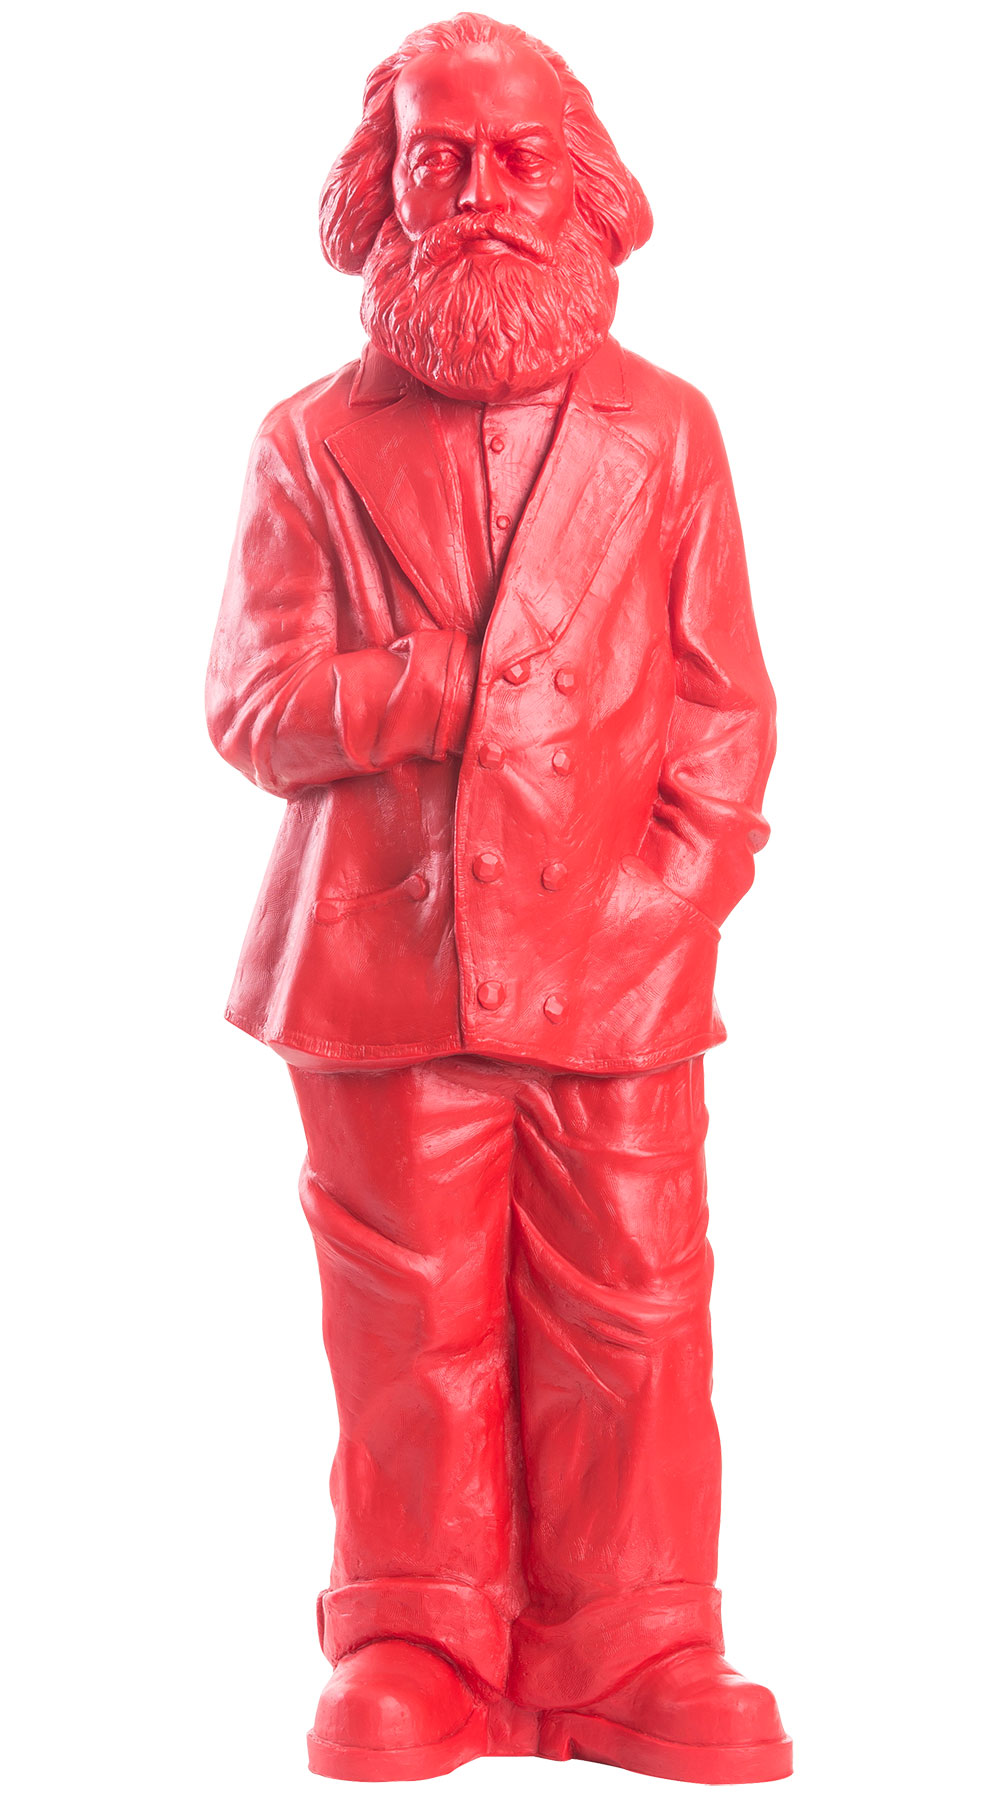 "Skulptur ""Karl Marx"", Version in Signalrot"